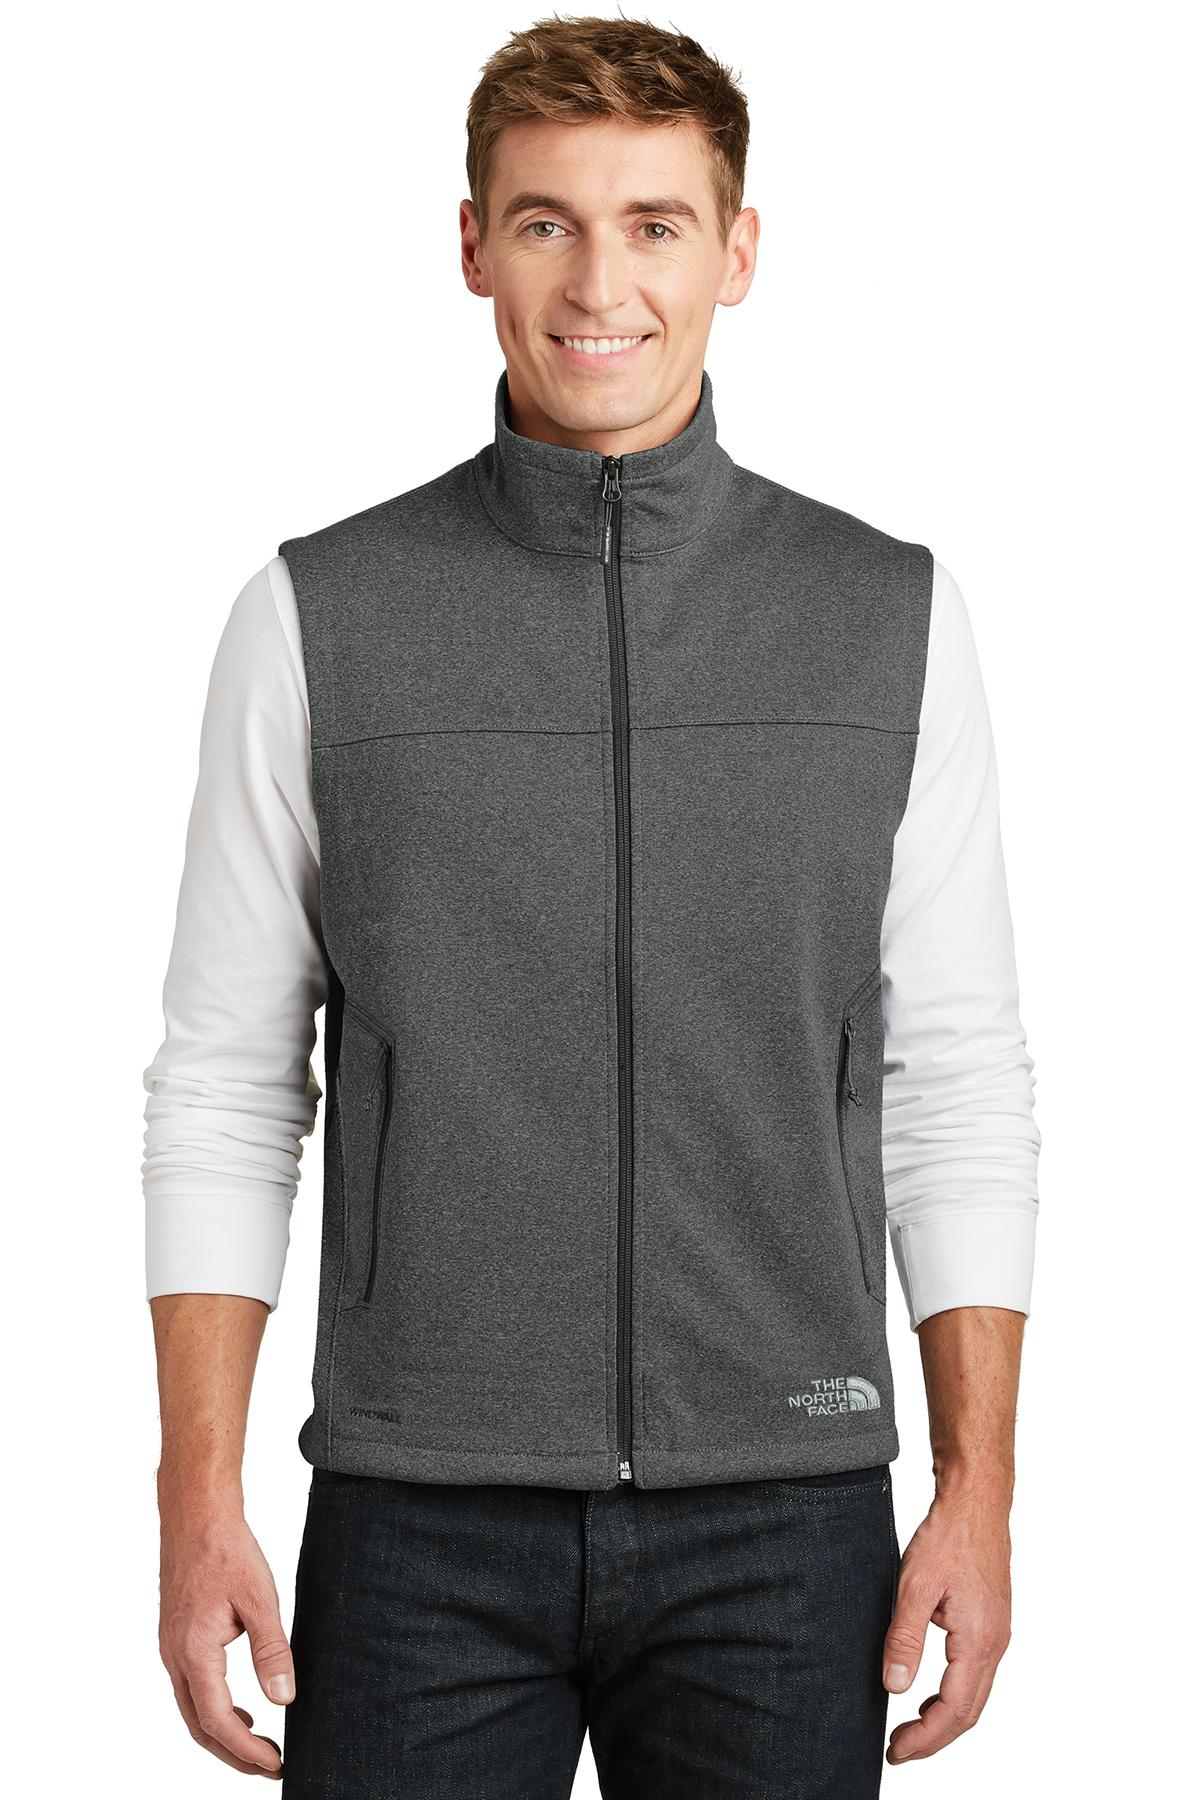 The North Face® NF0A3LGZ - Men's Ridgeline Soft ...